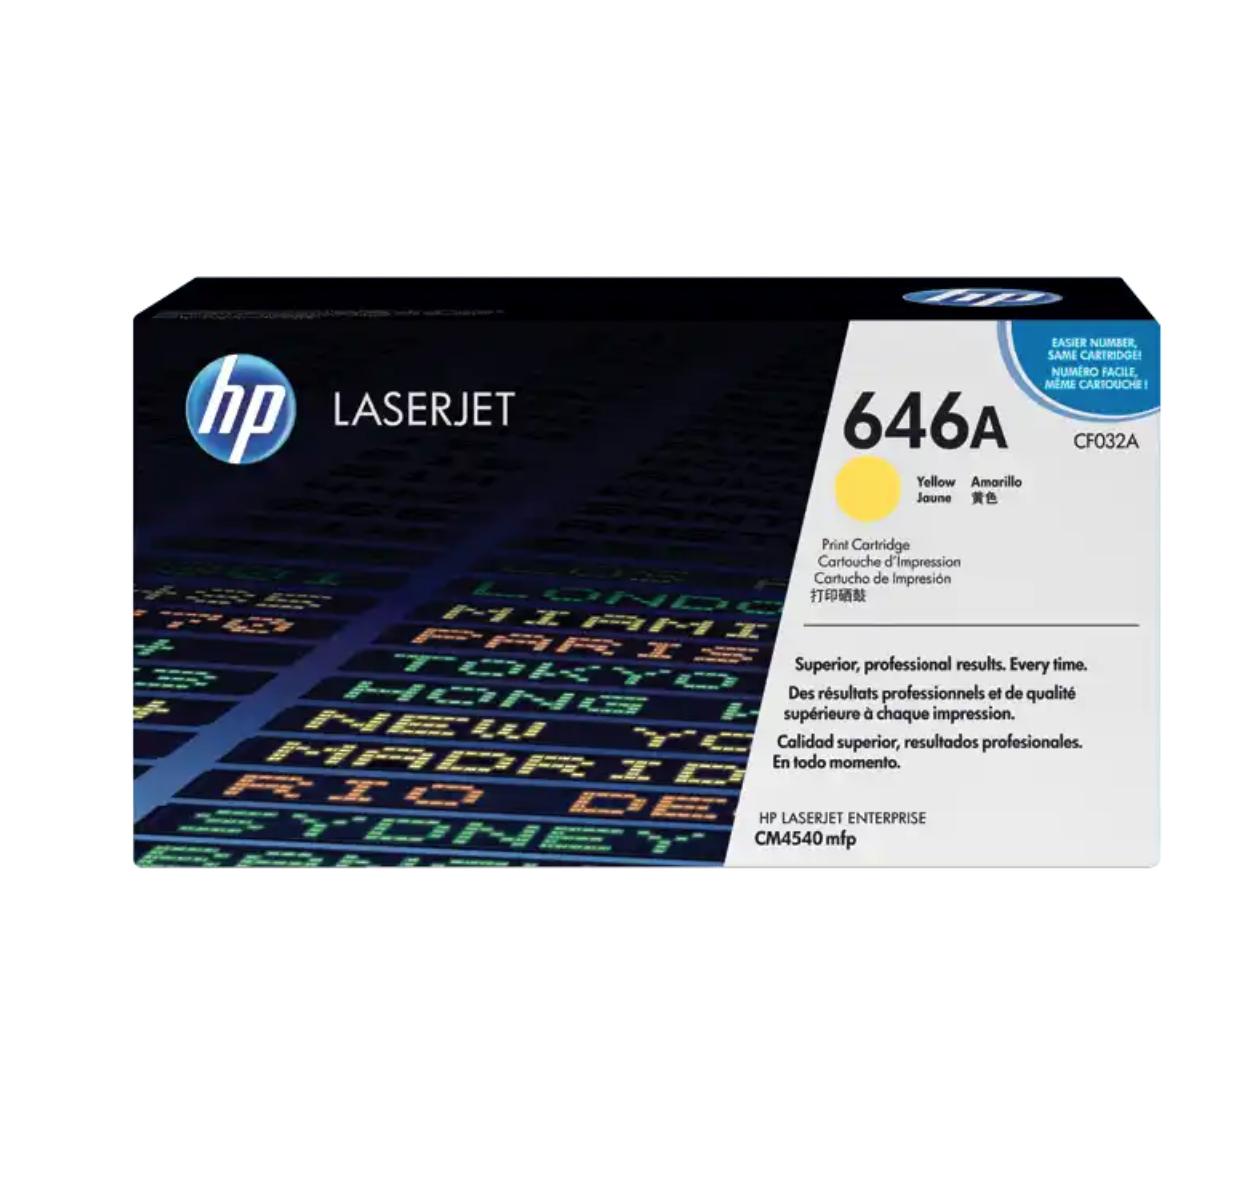 HP 646A 黃色原廠 LaserJet 碳粉 CF032A